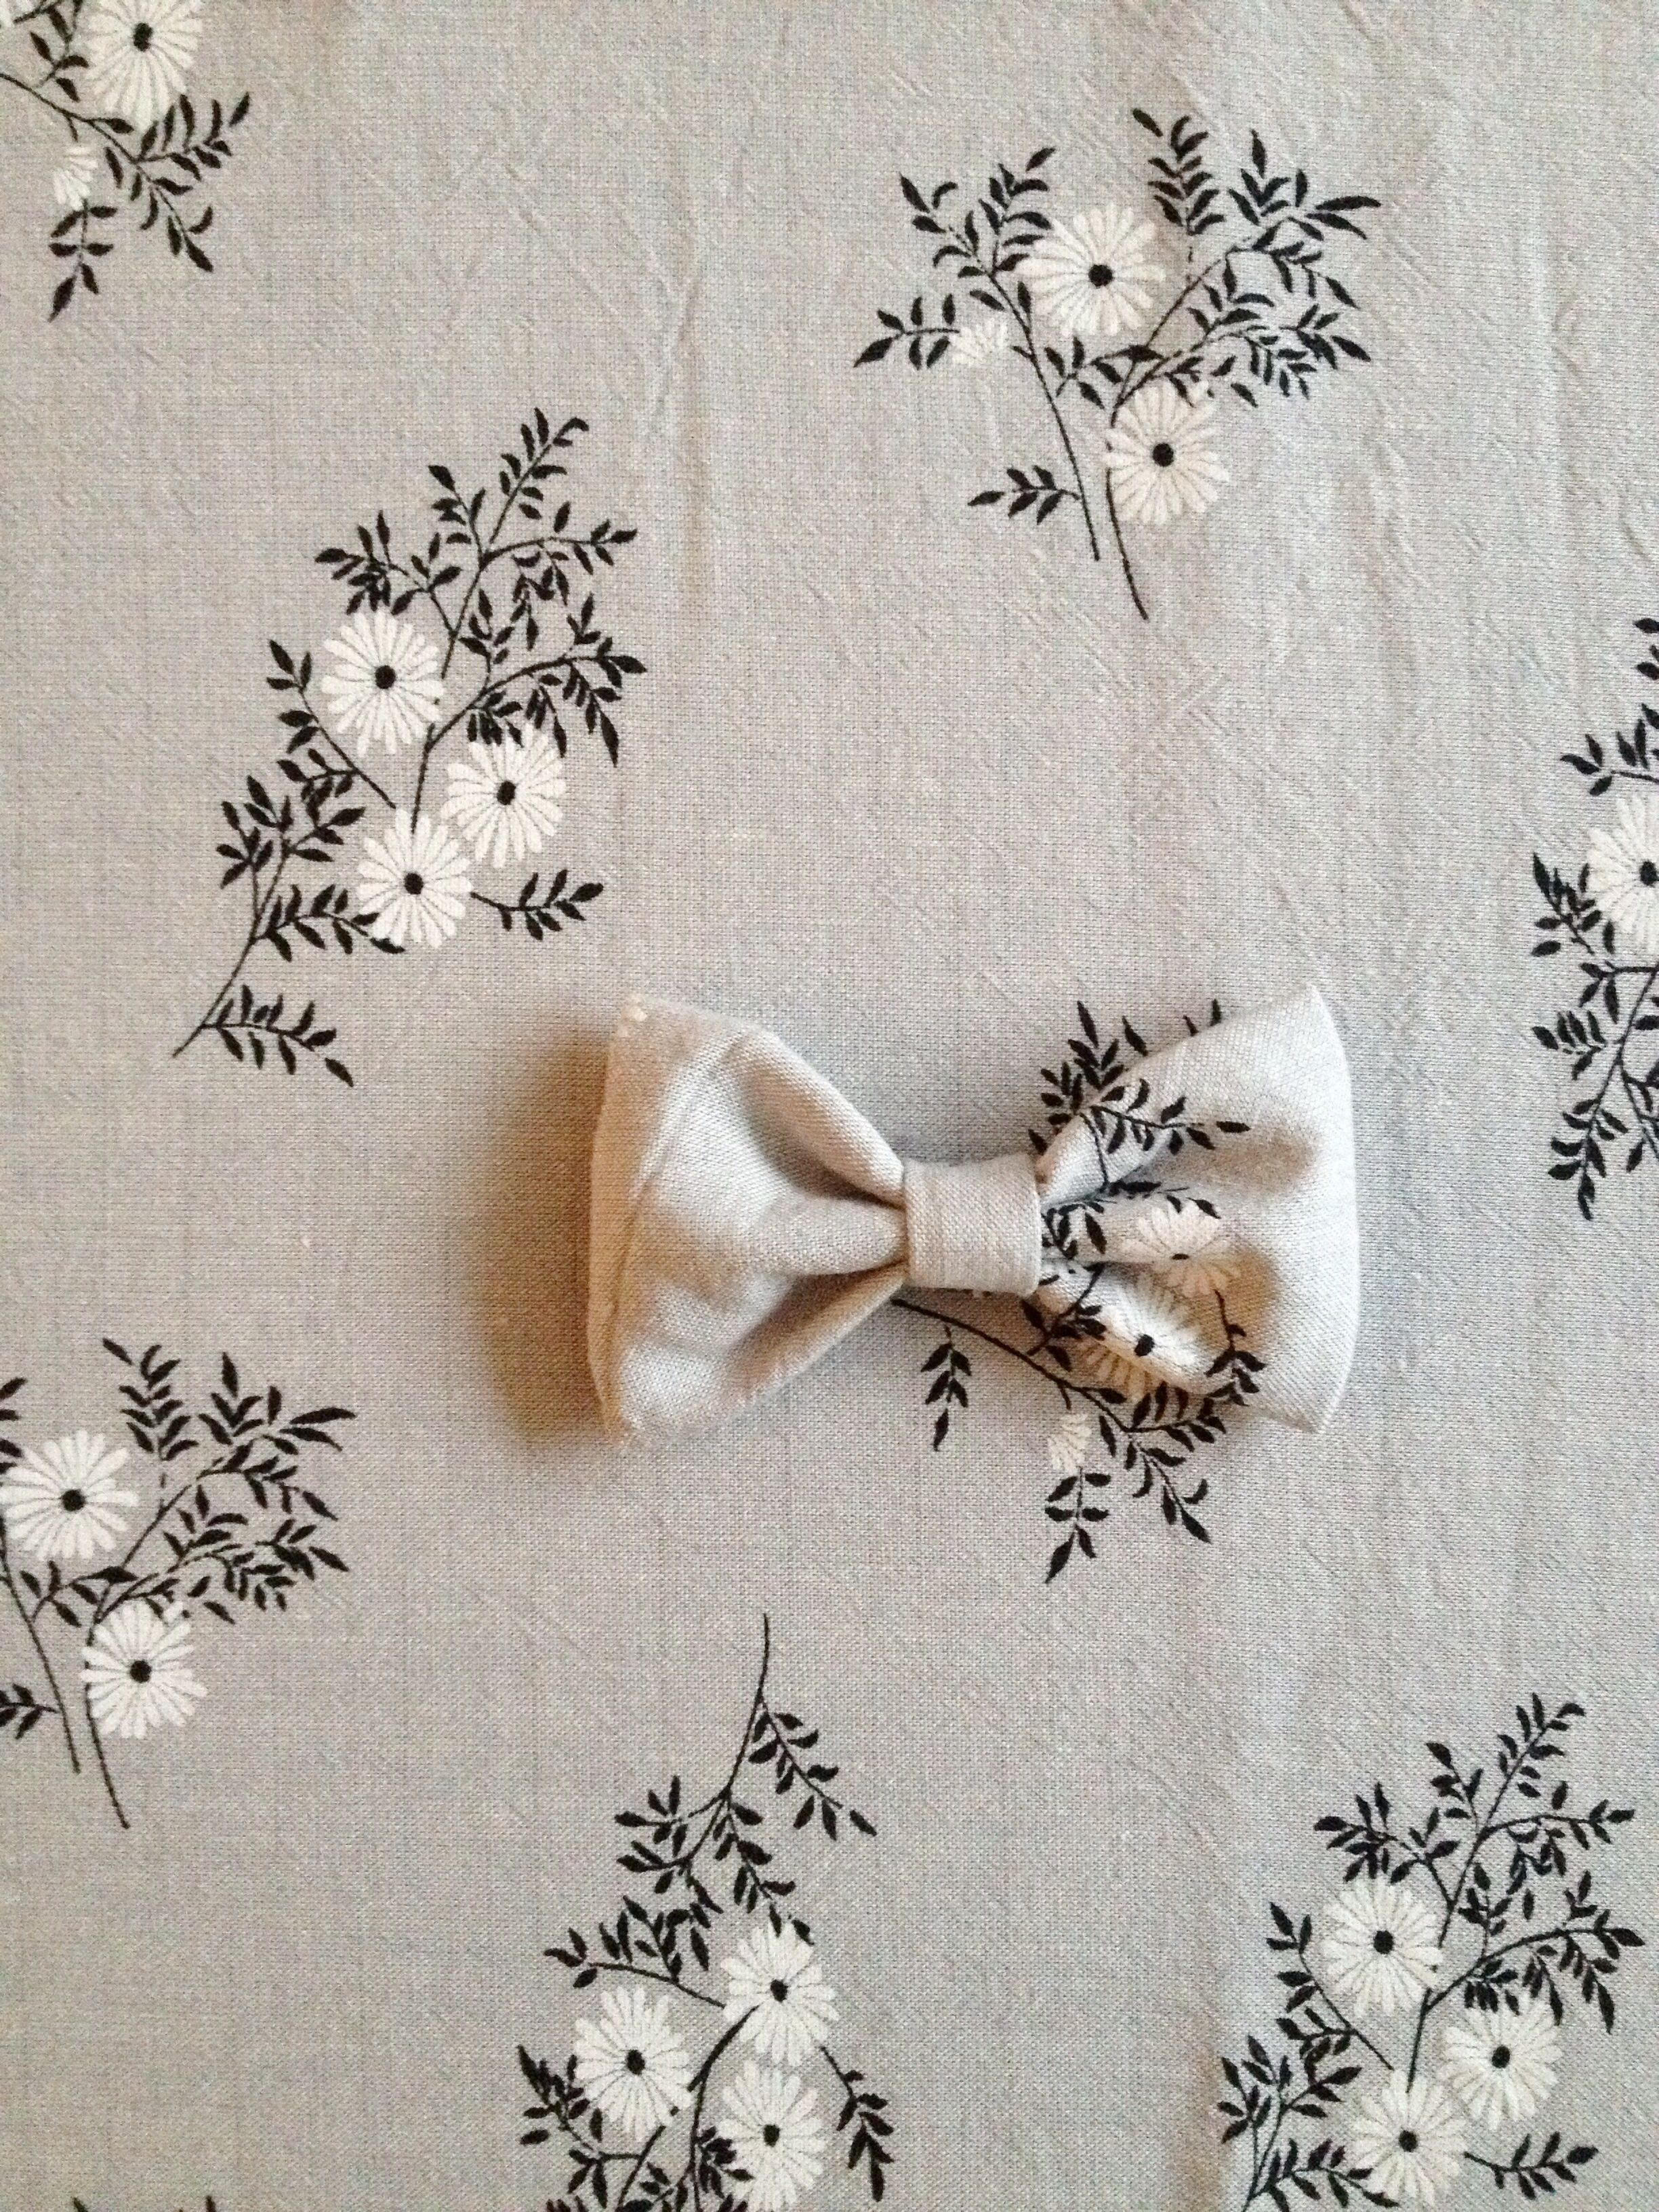 Suussies - bow - bowtie - vintage-  bow tie - fabric - handmade